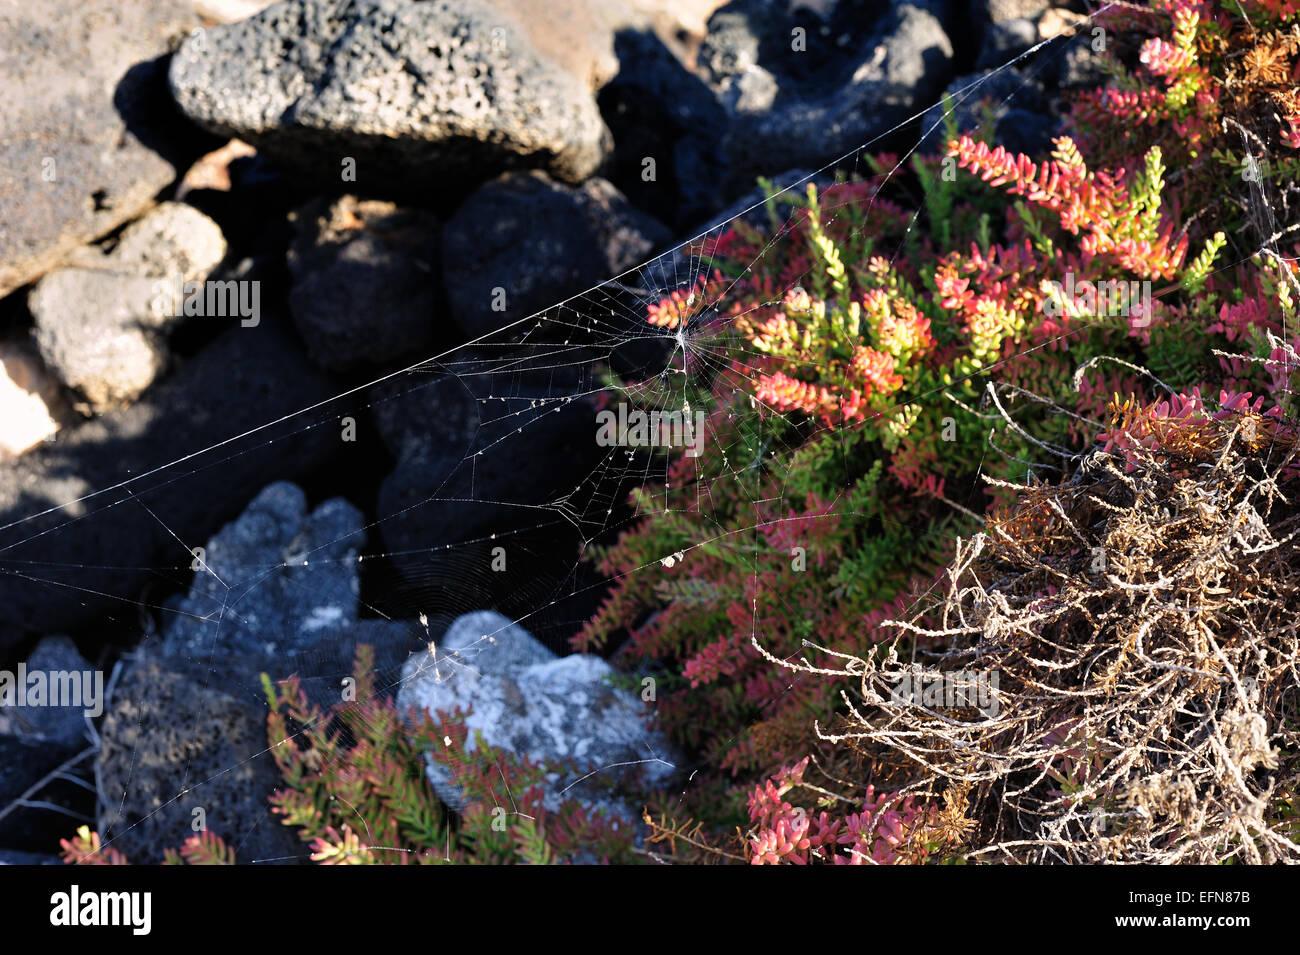 flora of volcanic Lanzarote Island, Canary Islands, Spain - Stock Image